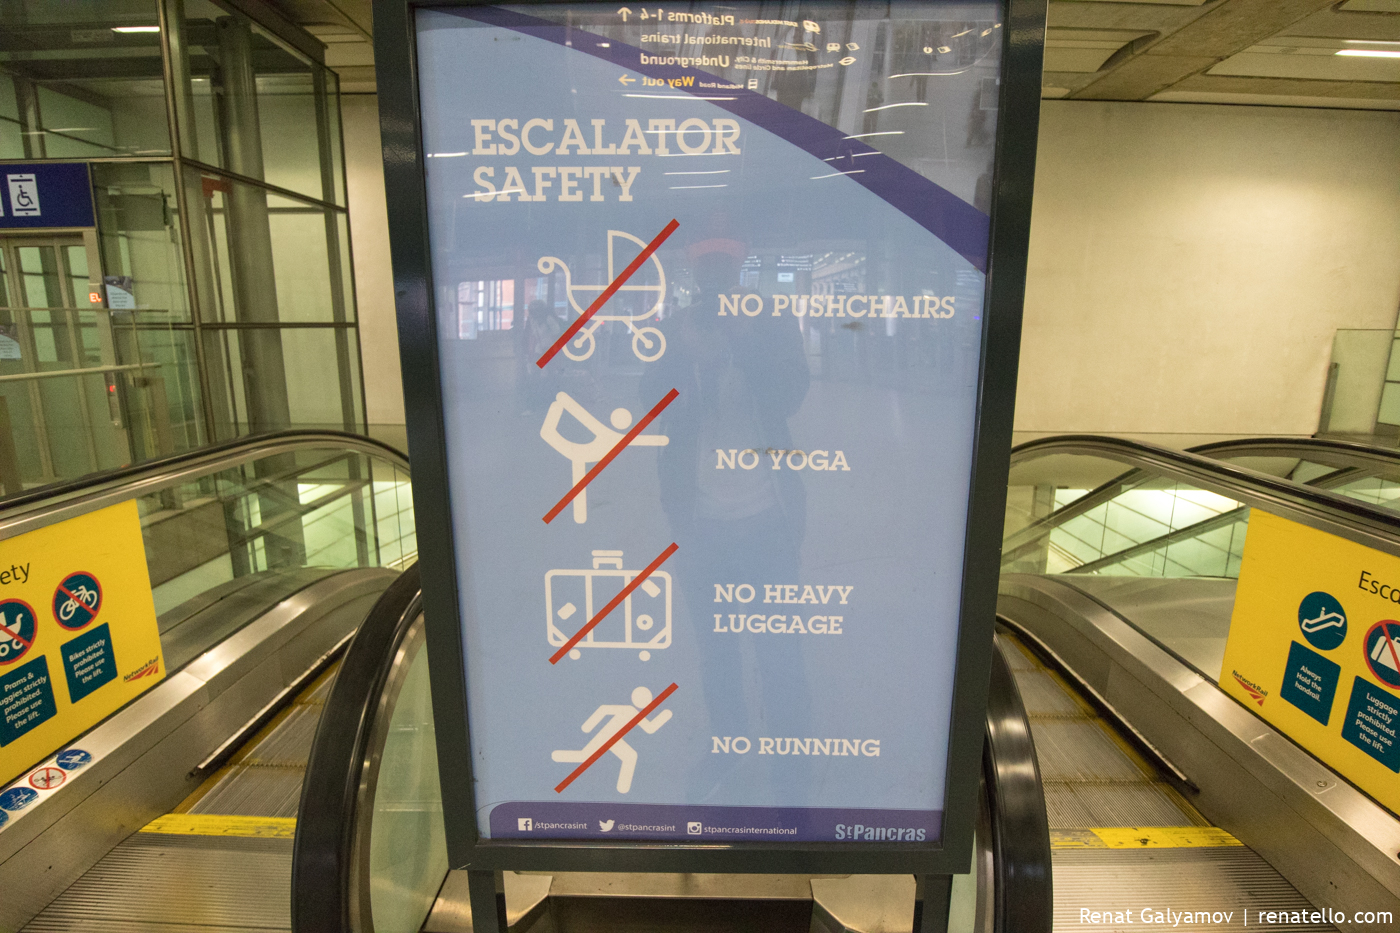 No yoga on the escalator sign.